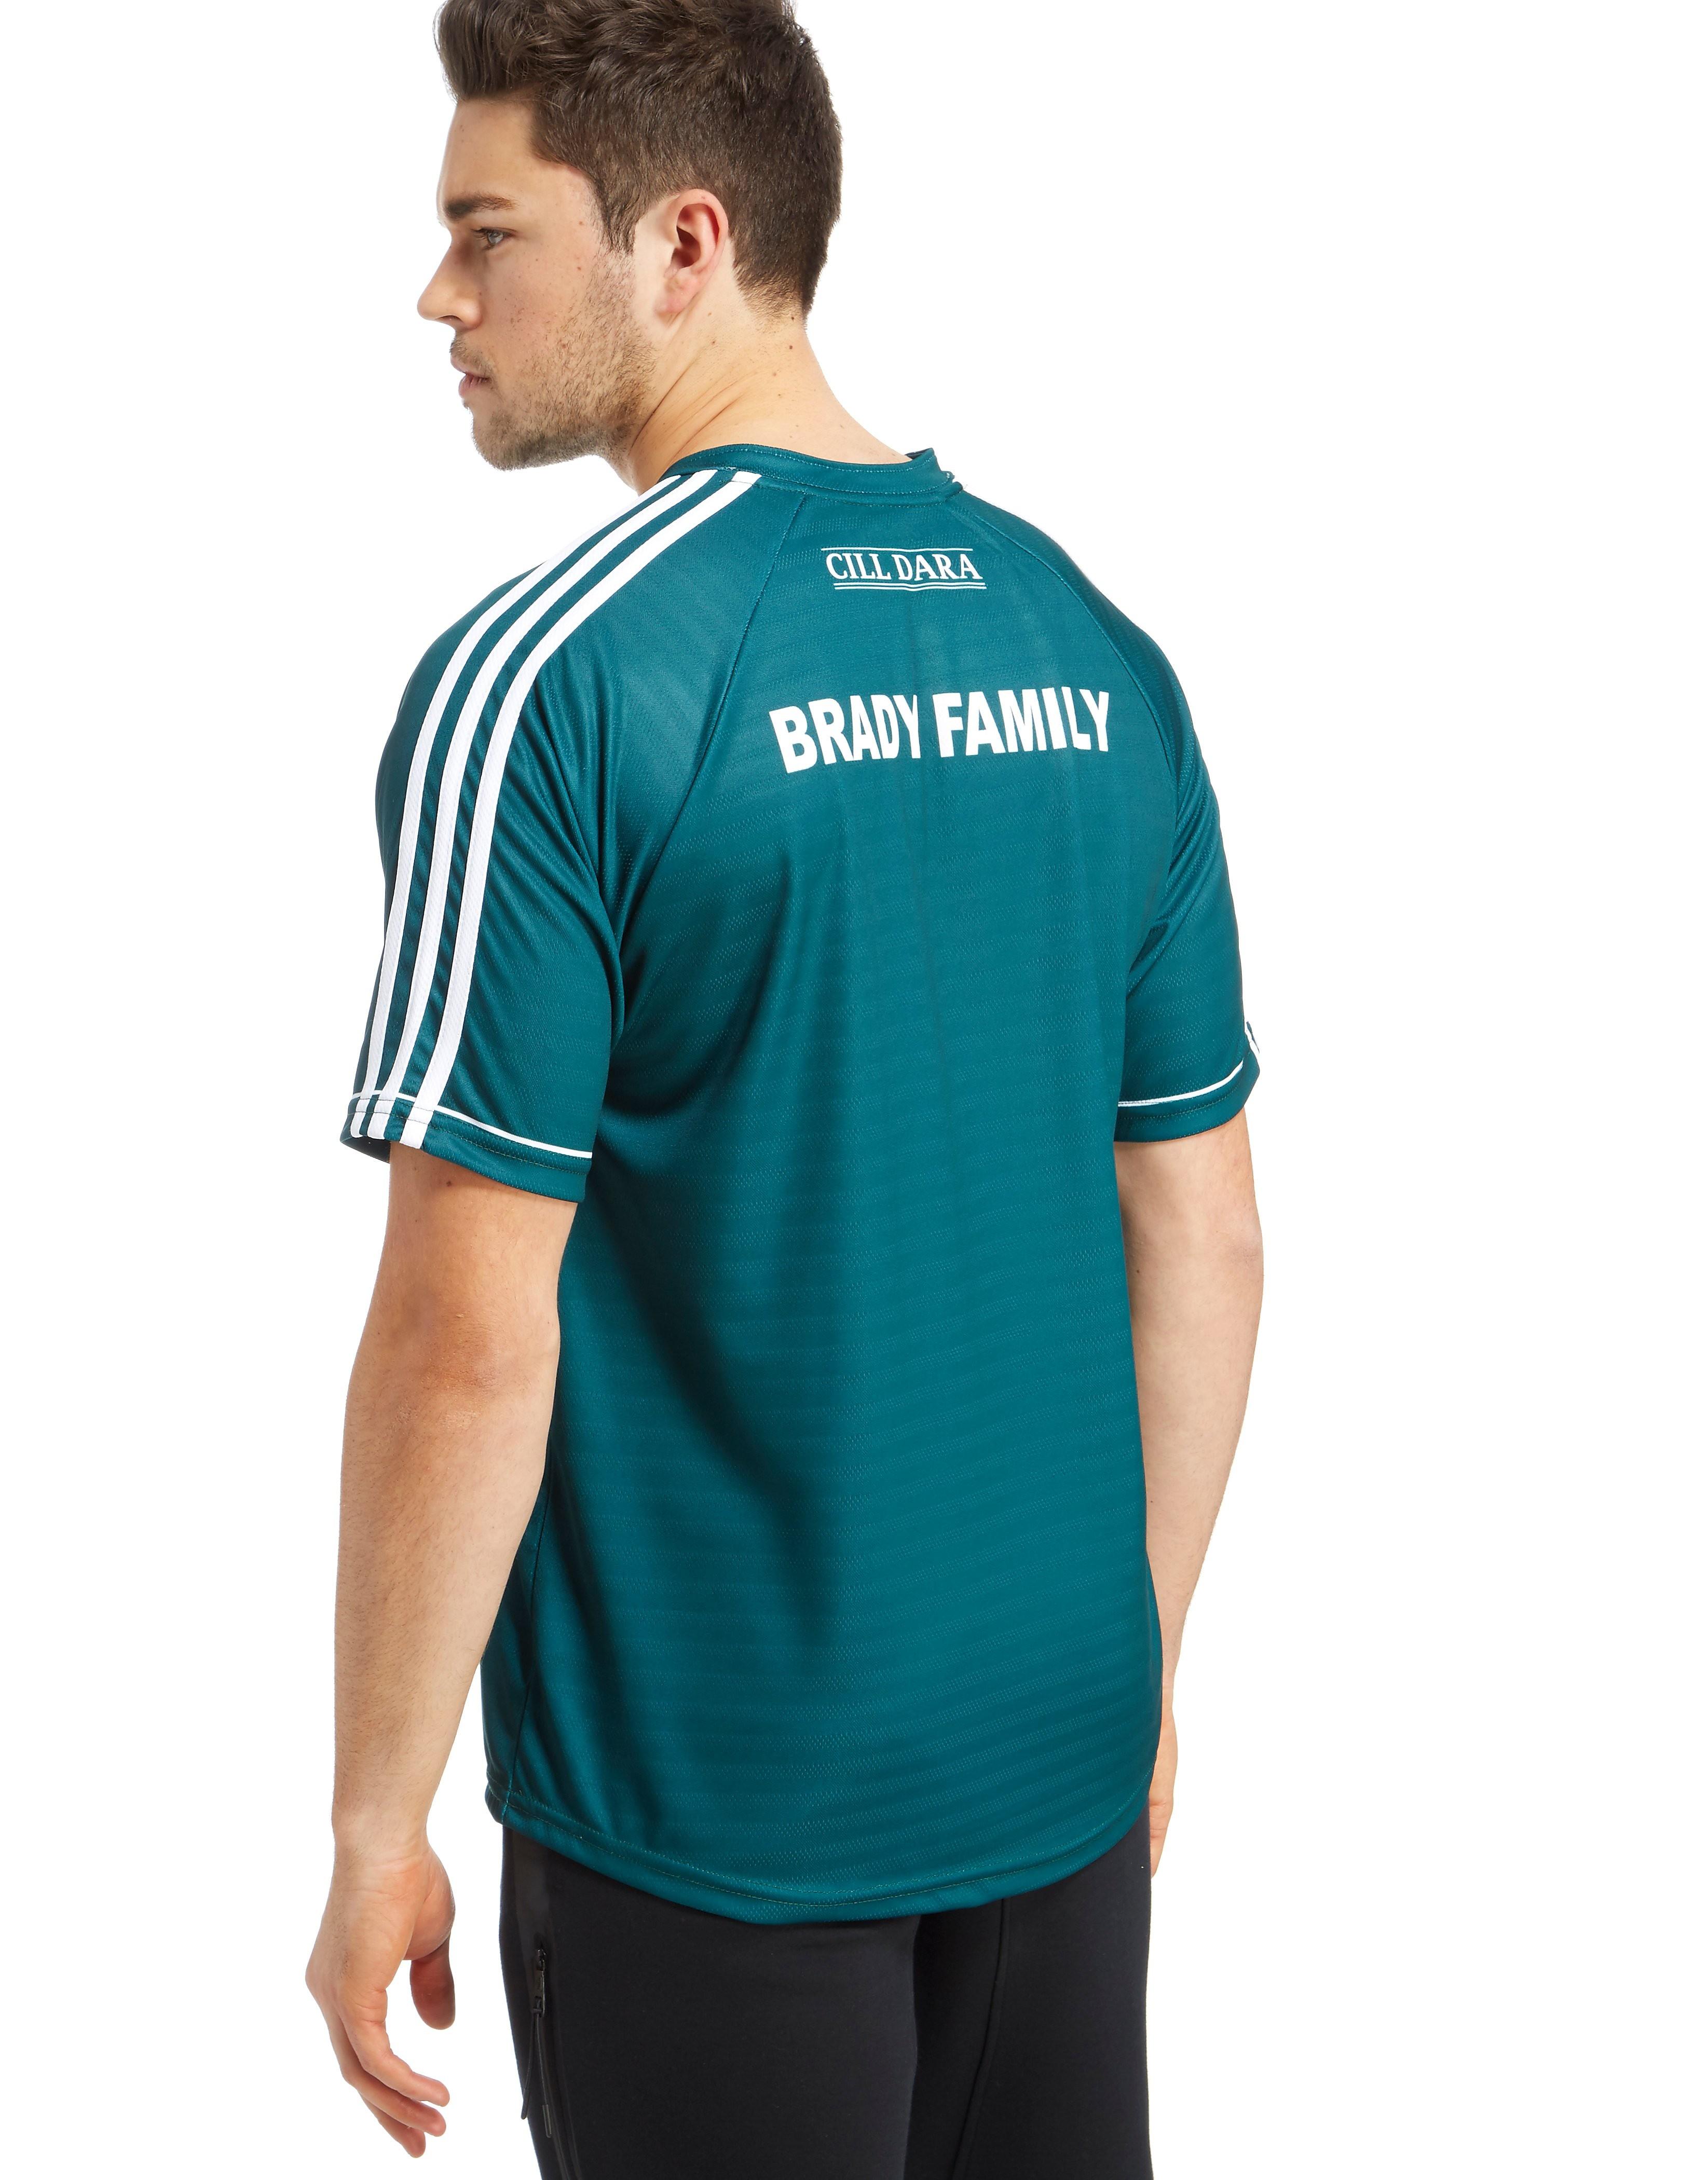 O'Neills Kildare Away 2016 Shirt